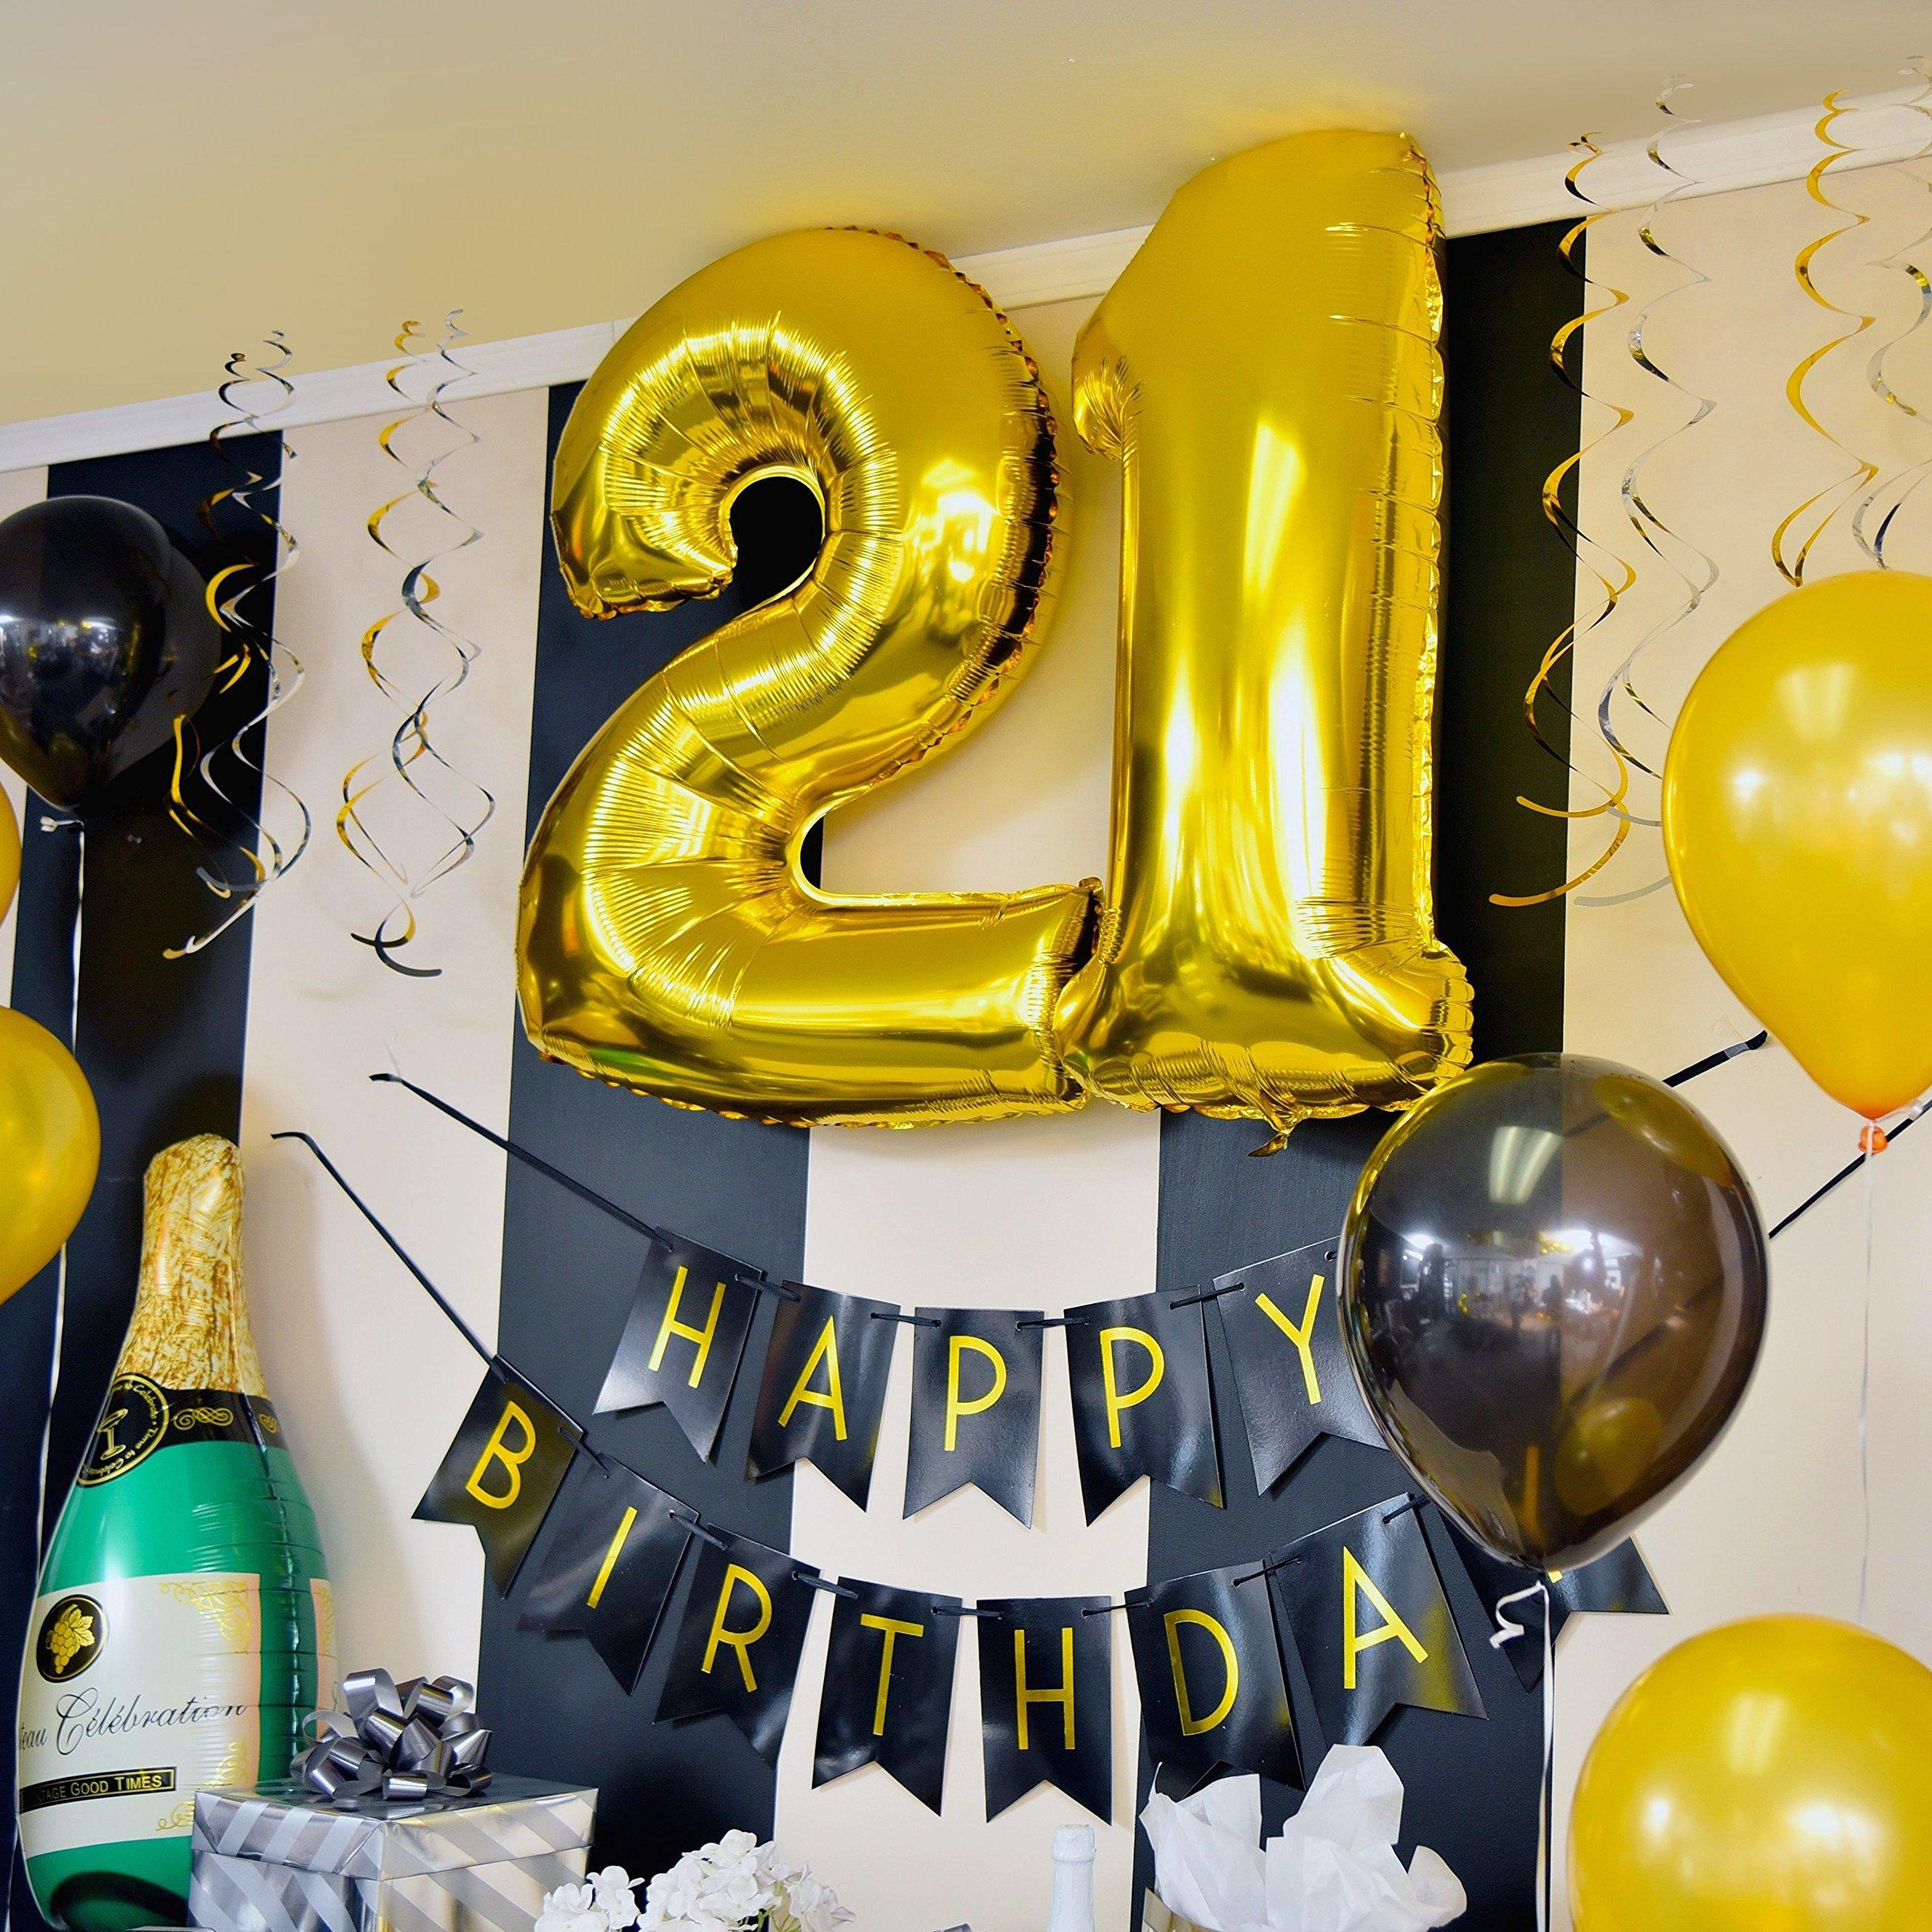 21st Birthday Party Pack Black Gold Happy Birthday Bunting